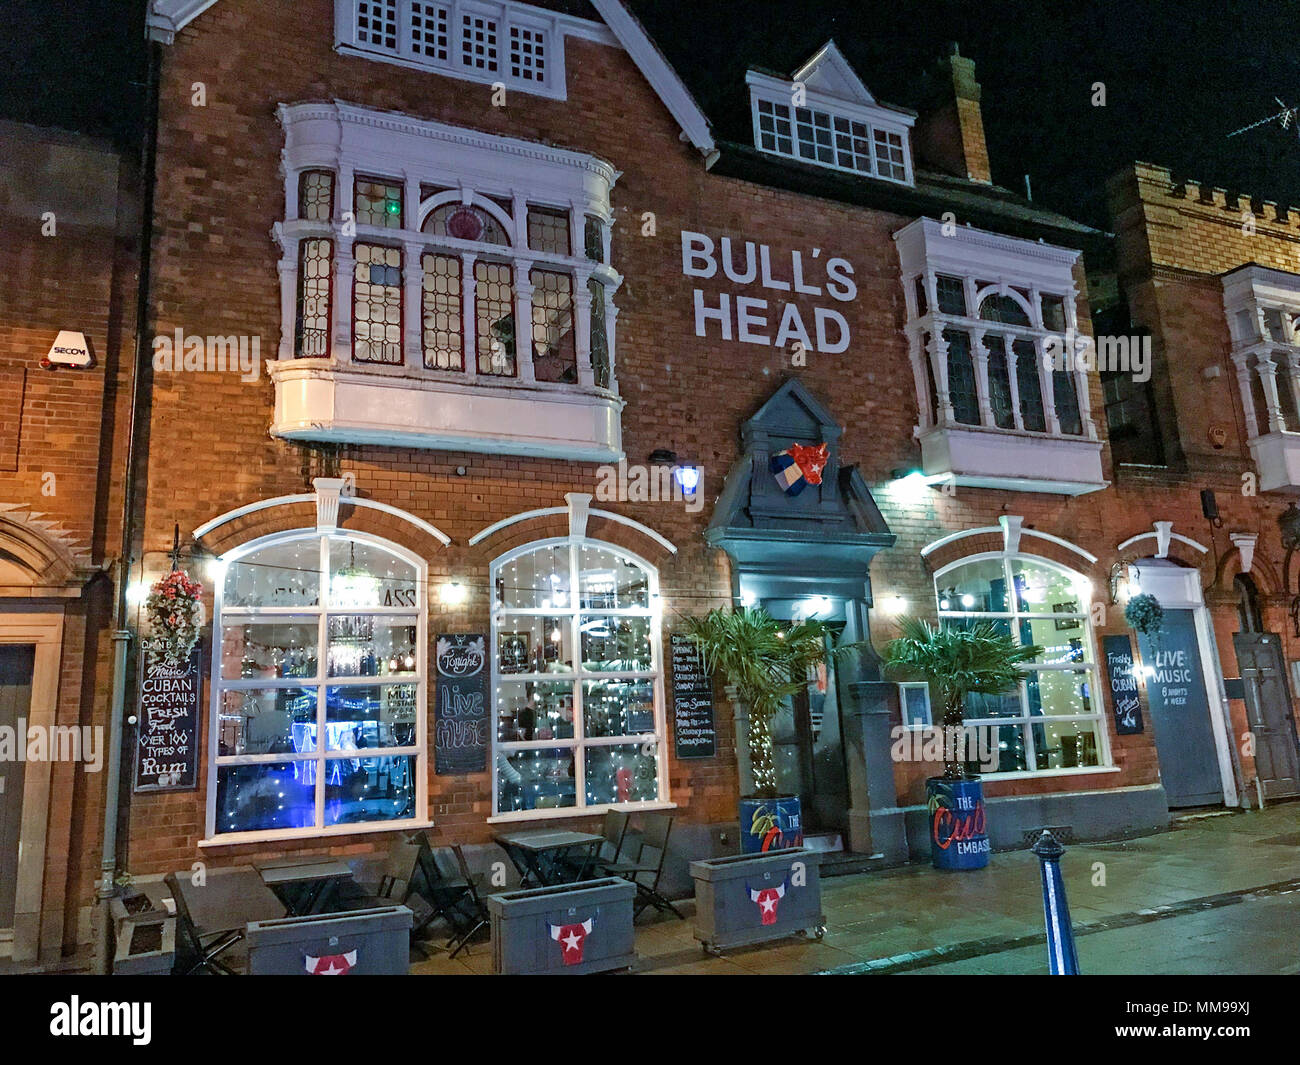 GoTonysmith,@HotpixUK,pub,bar,at,dusk,nighttime,evening,night,B13,village,Moseley Village,B13 8HW,UK,city,city centre,CAMRA,real ale,beer,drinking,Cuban Embassy,rum,latin,music